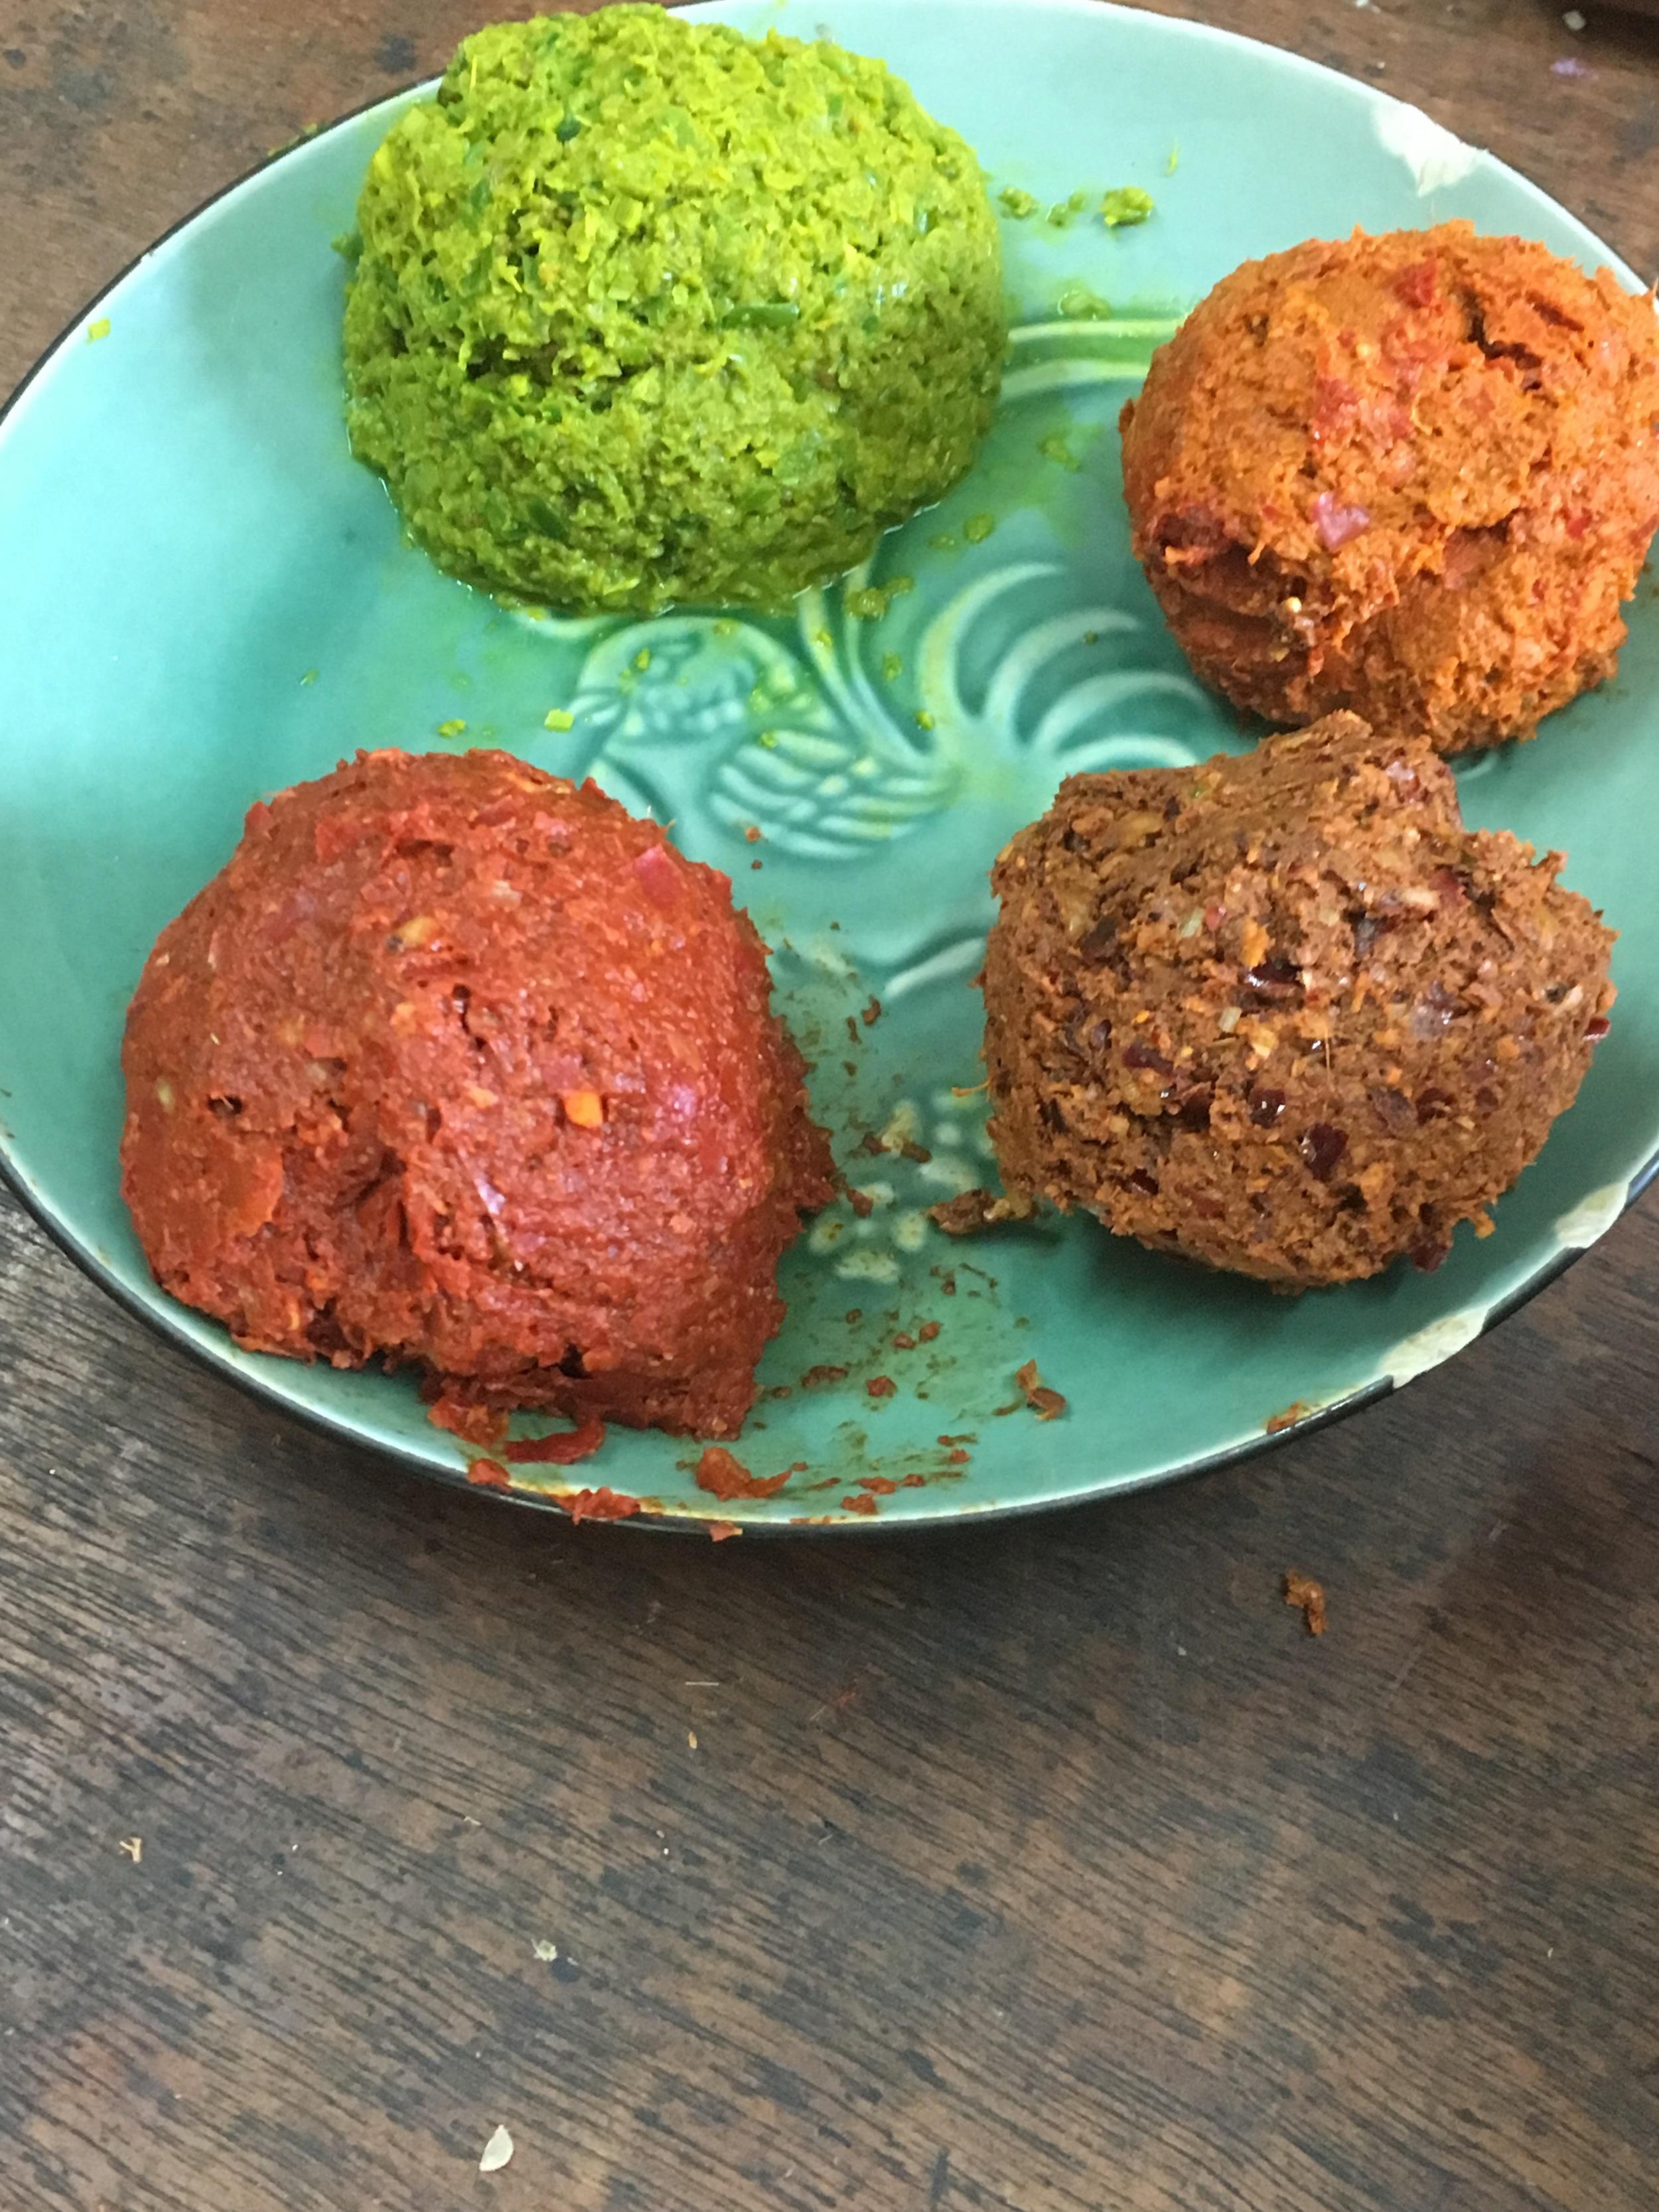 Green, penang, massaman and red curry pastes